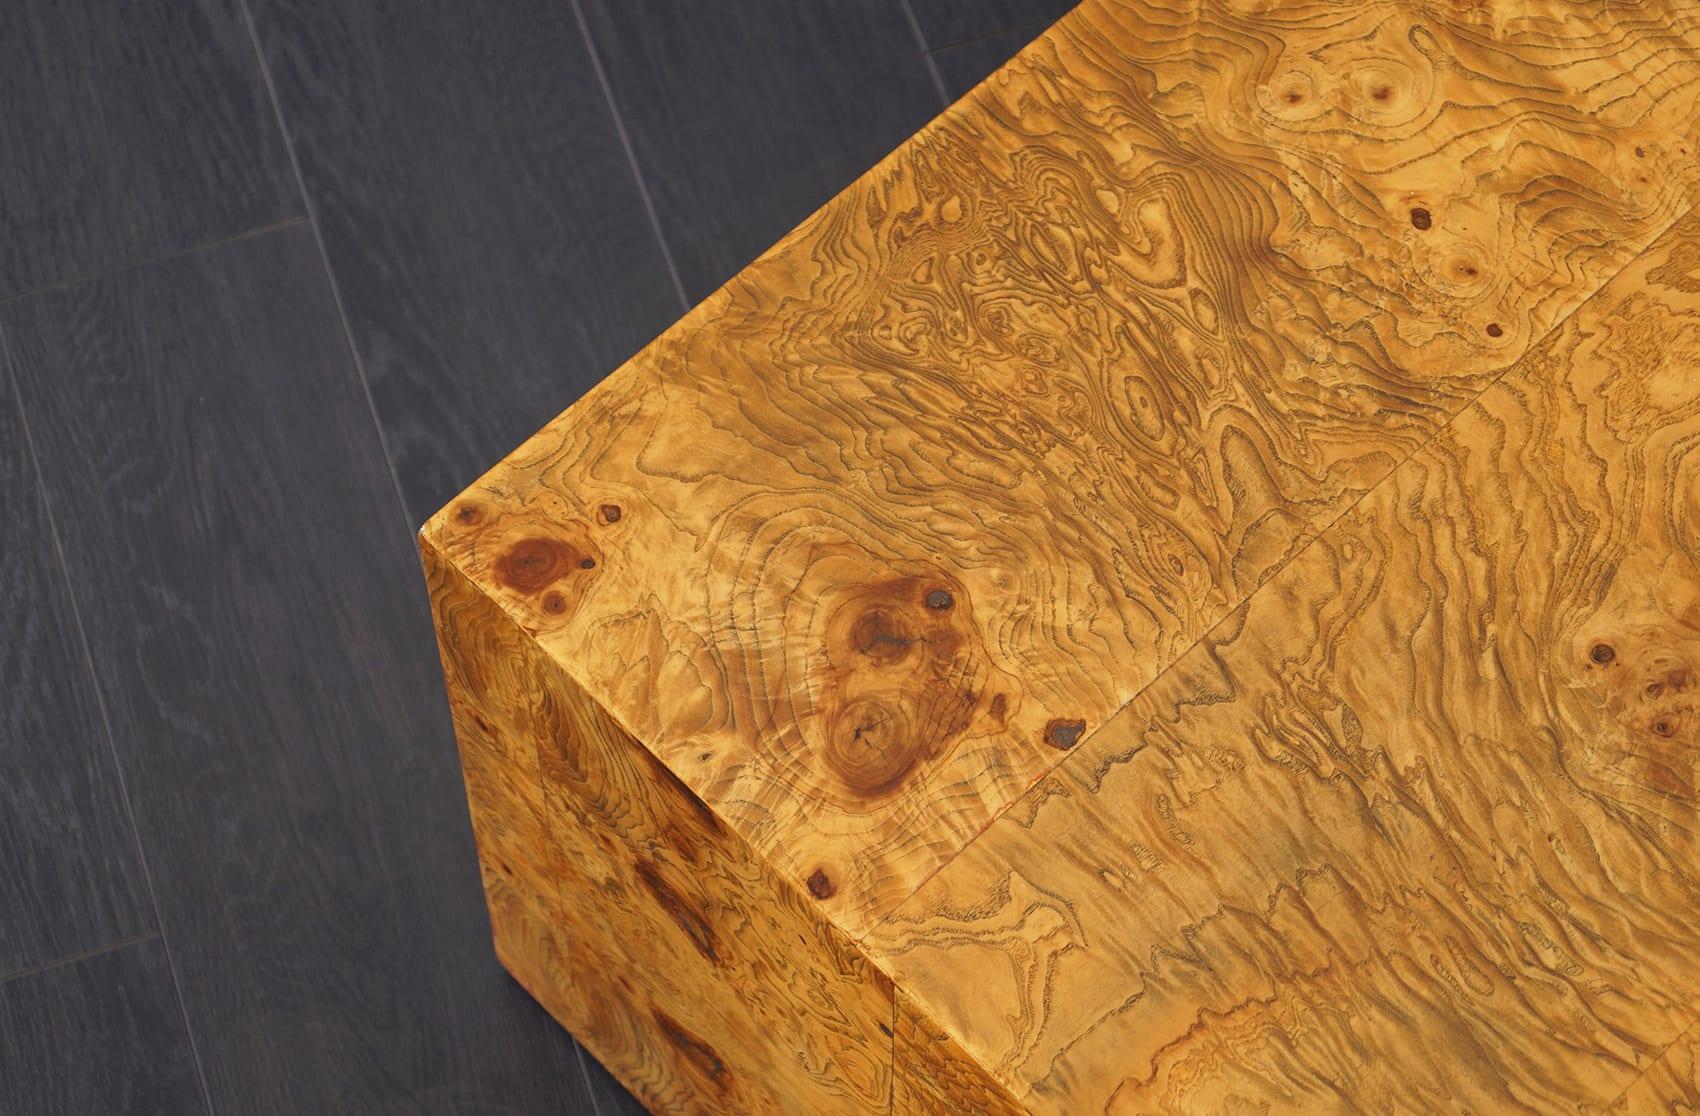 Vintage Burl Wood Coffee Table by Milo Baughman